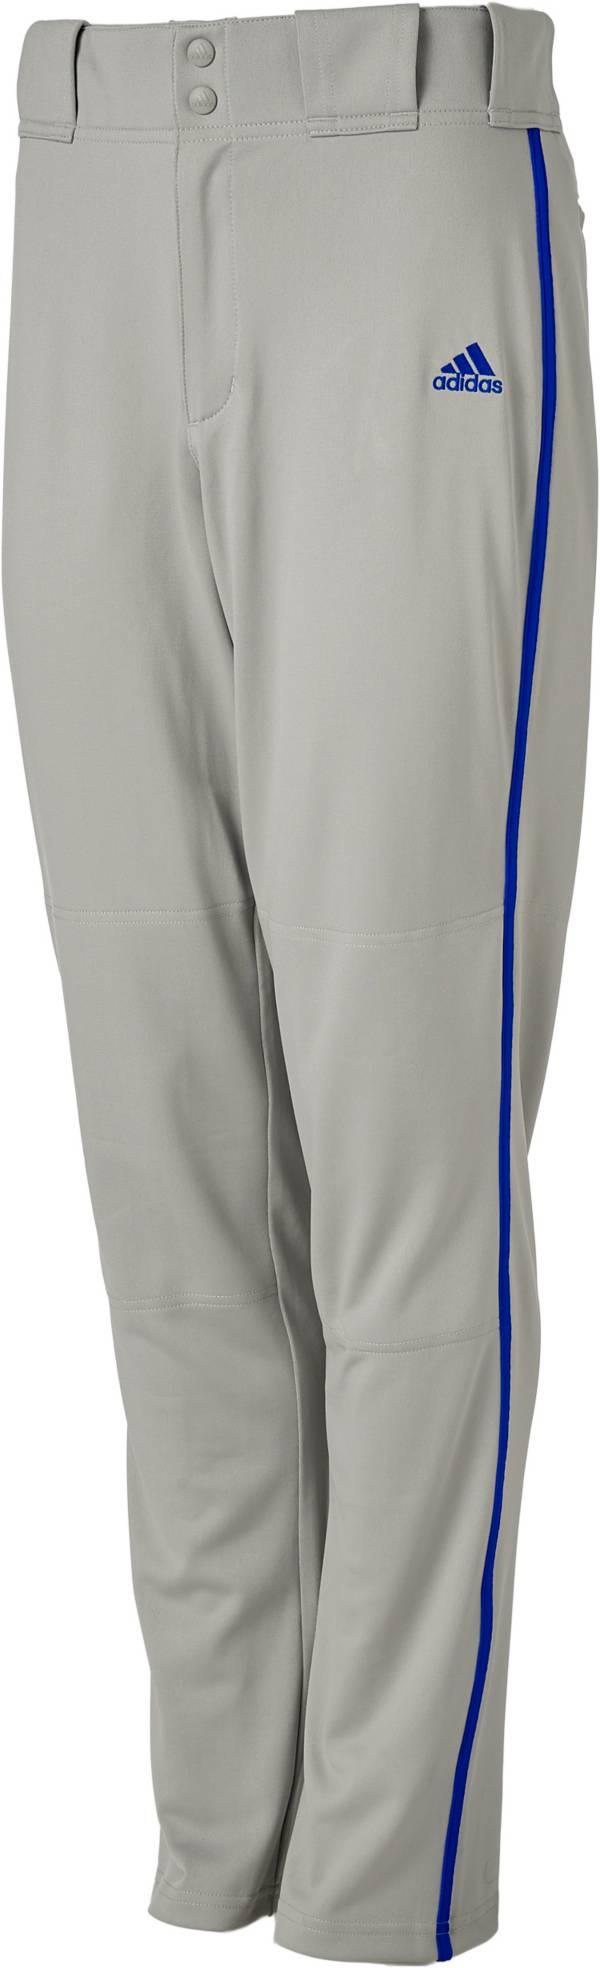 adidas Boys' Phenom Open Bottom Piped Baseball Pants product image